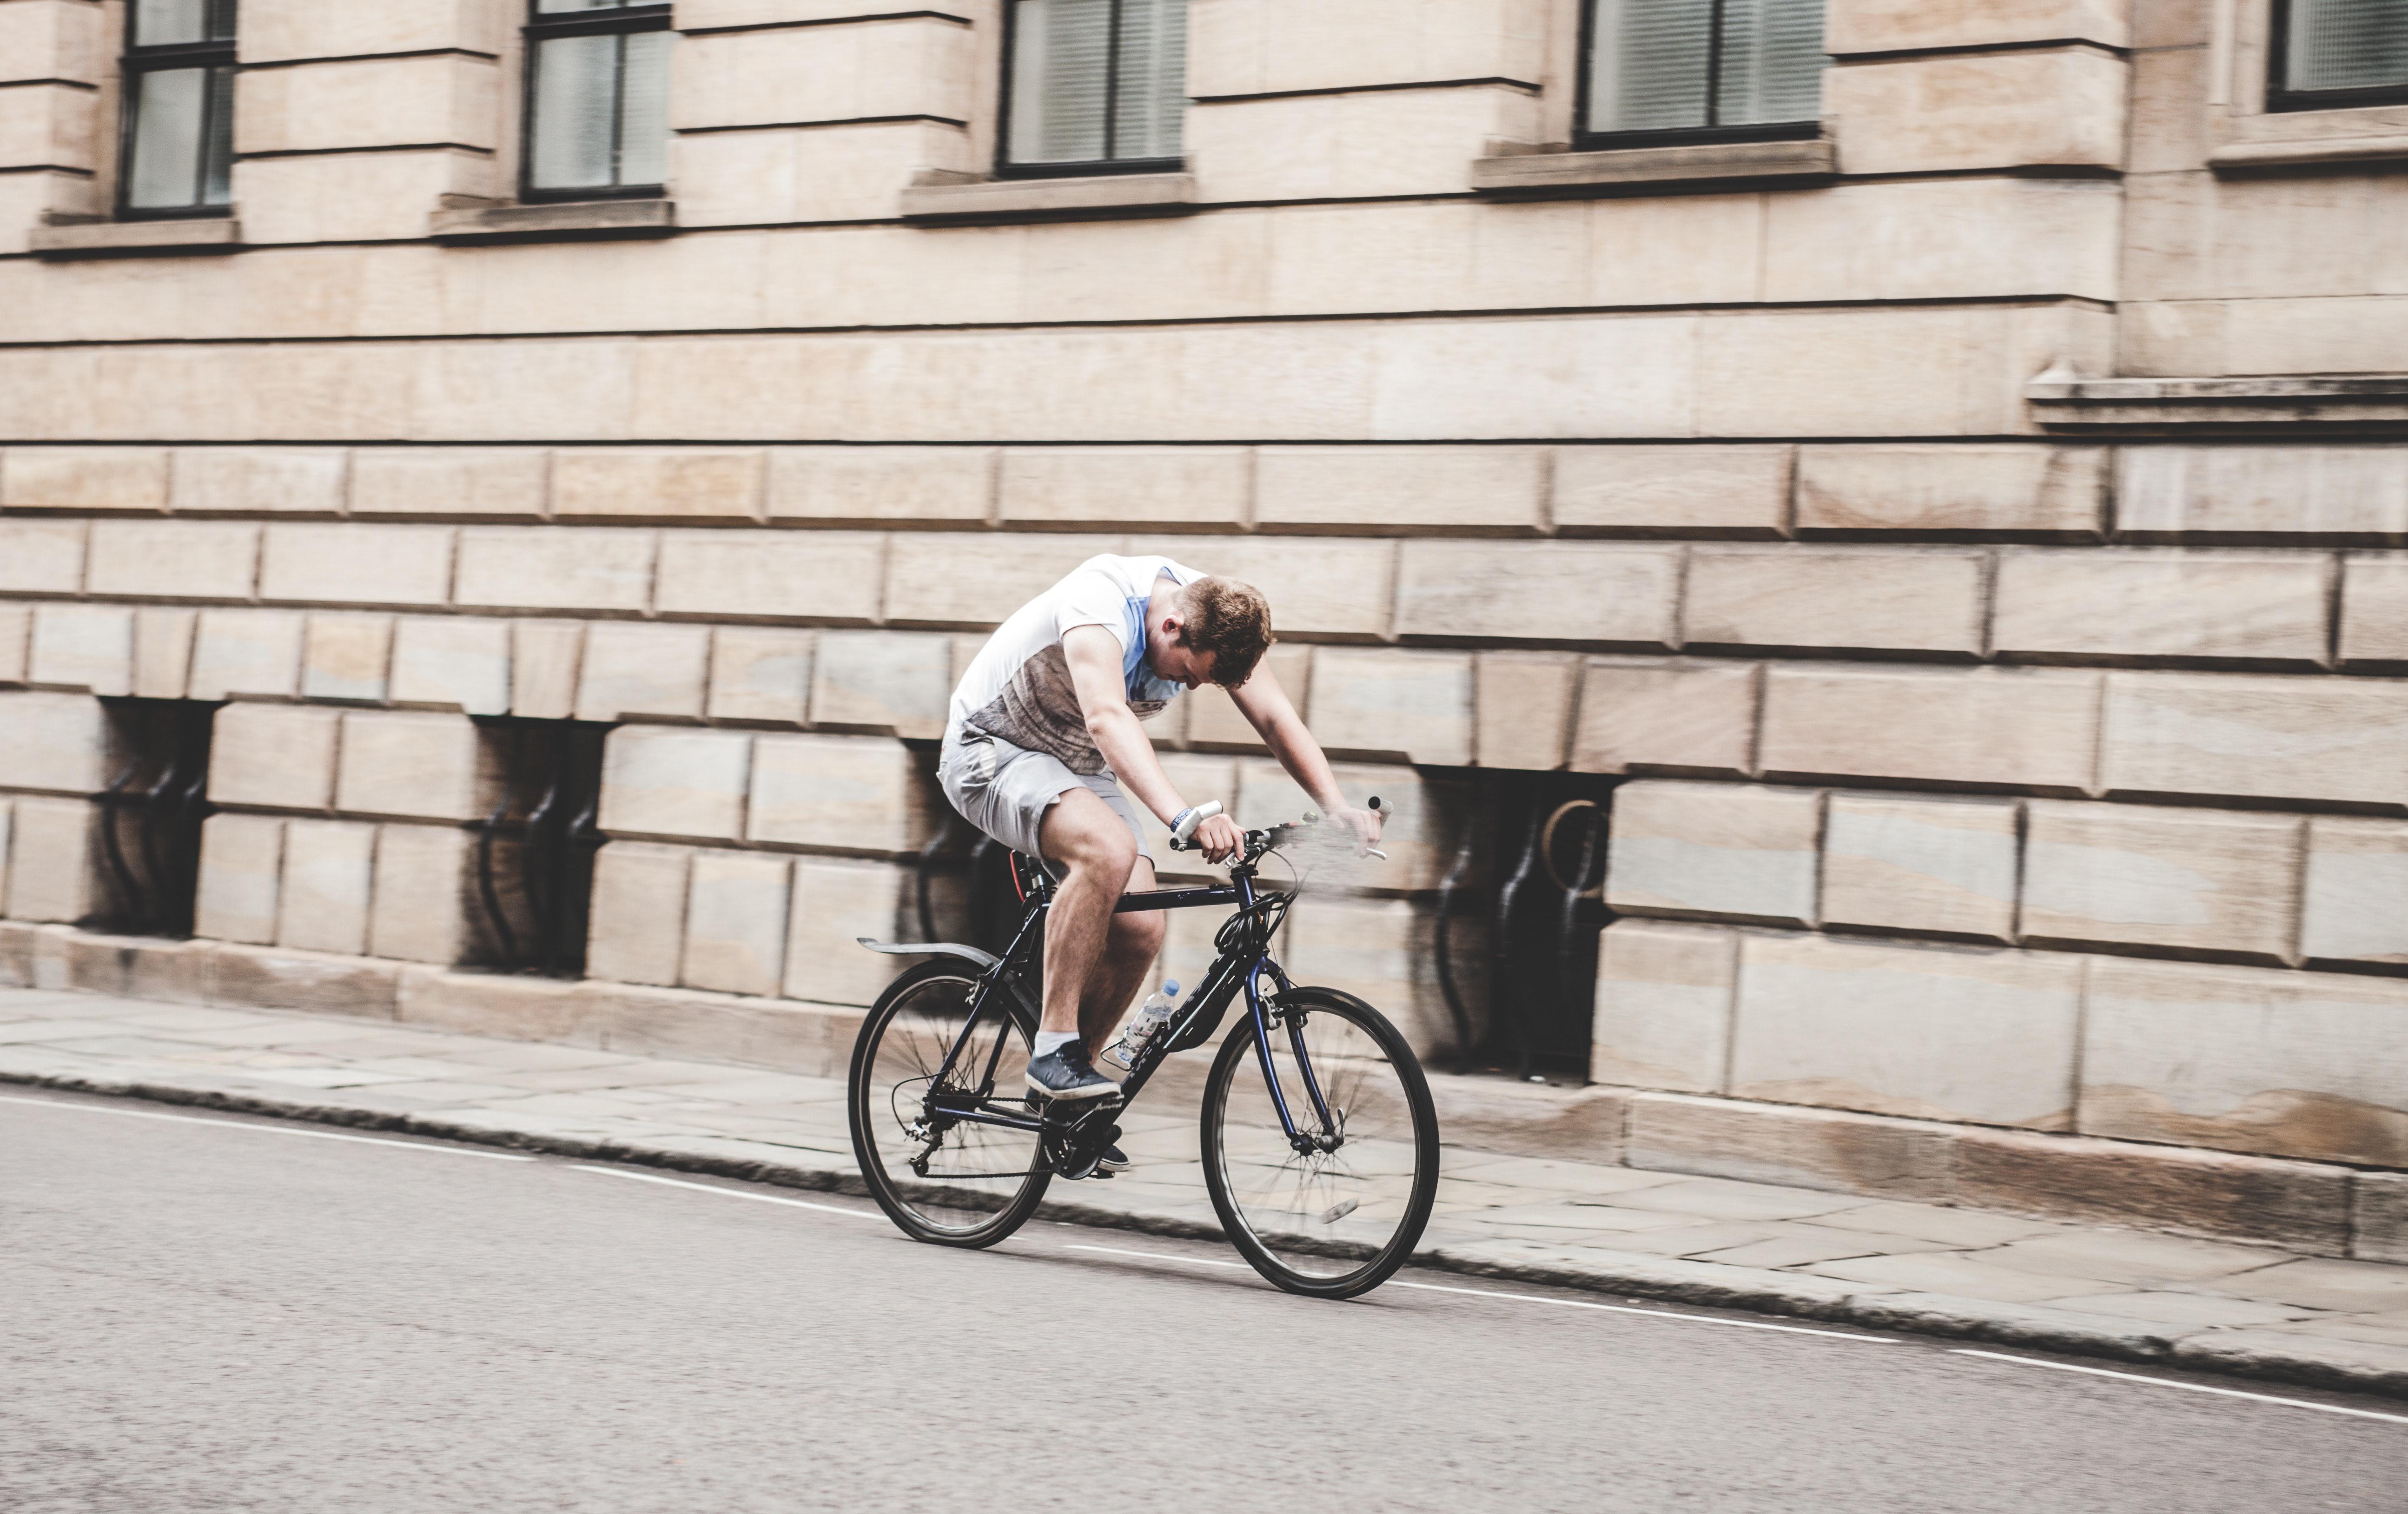 Man Riding Black Mountain Bike on Pathway during Daytime, Bicycle, Bike, Cyclist, Exercise, HQ Photo